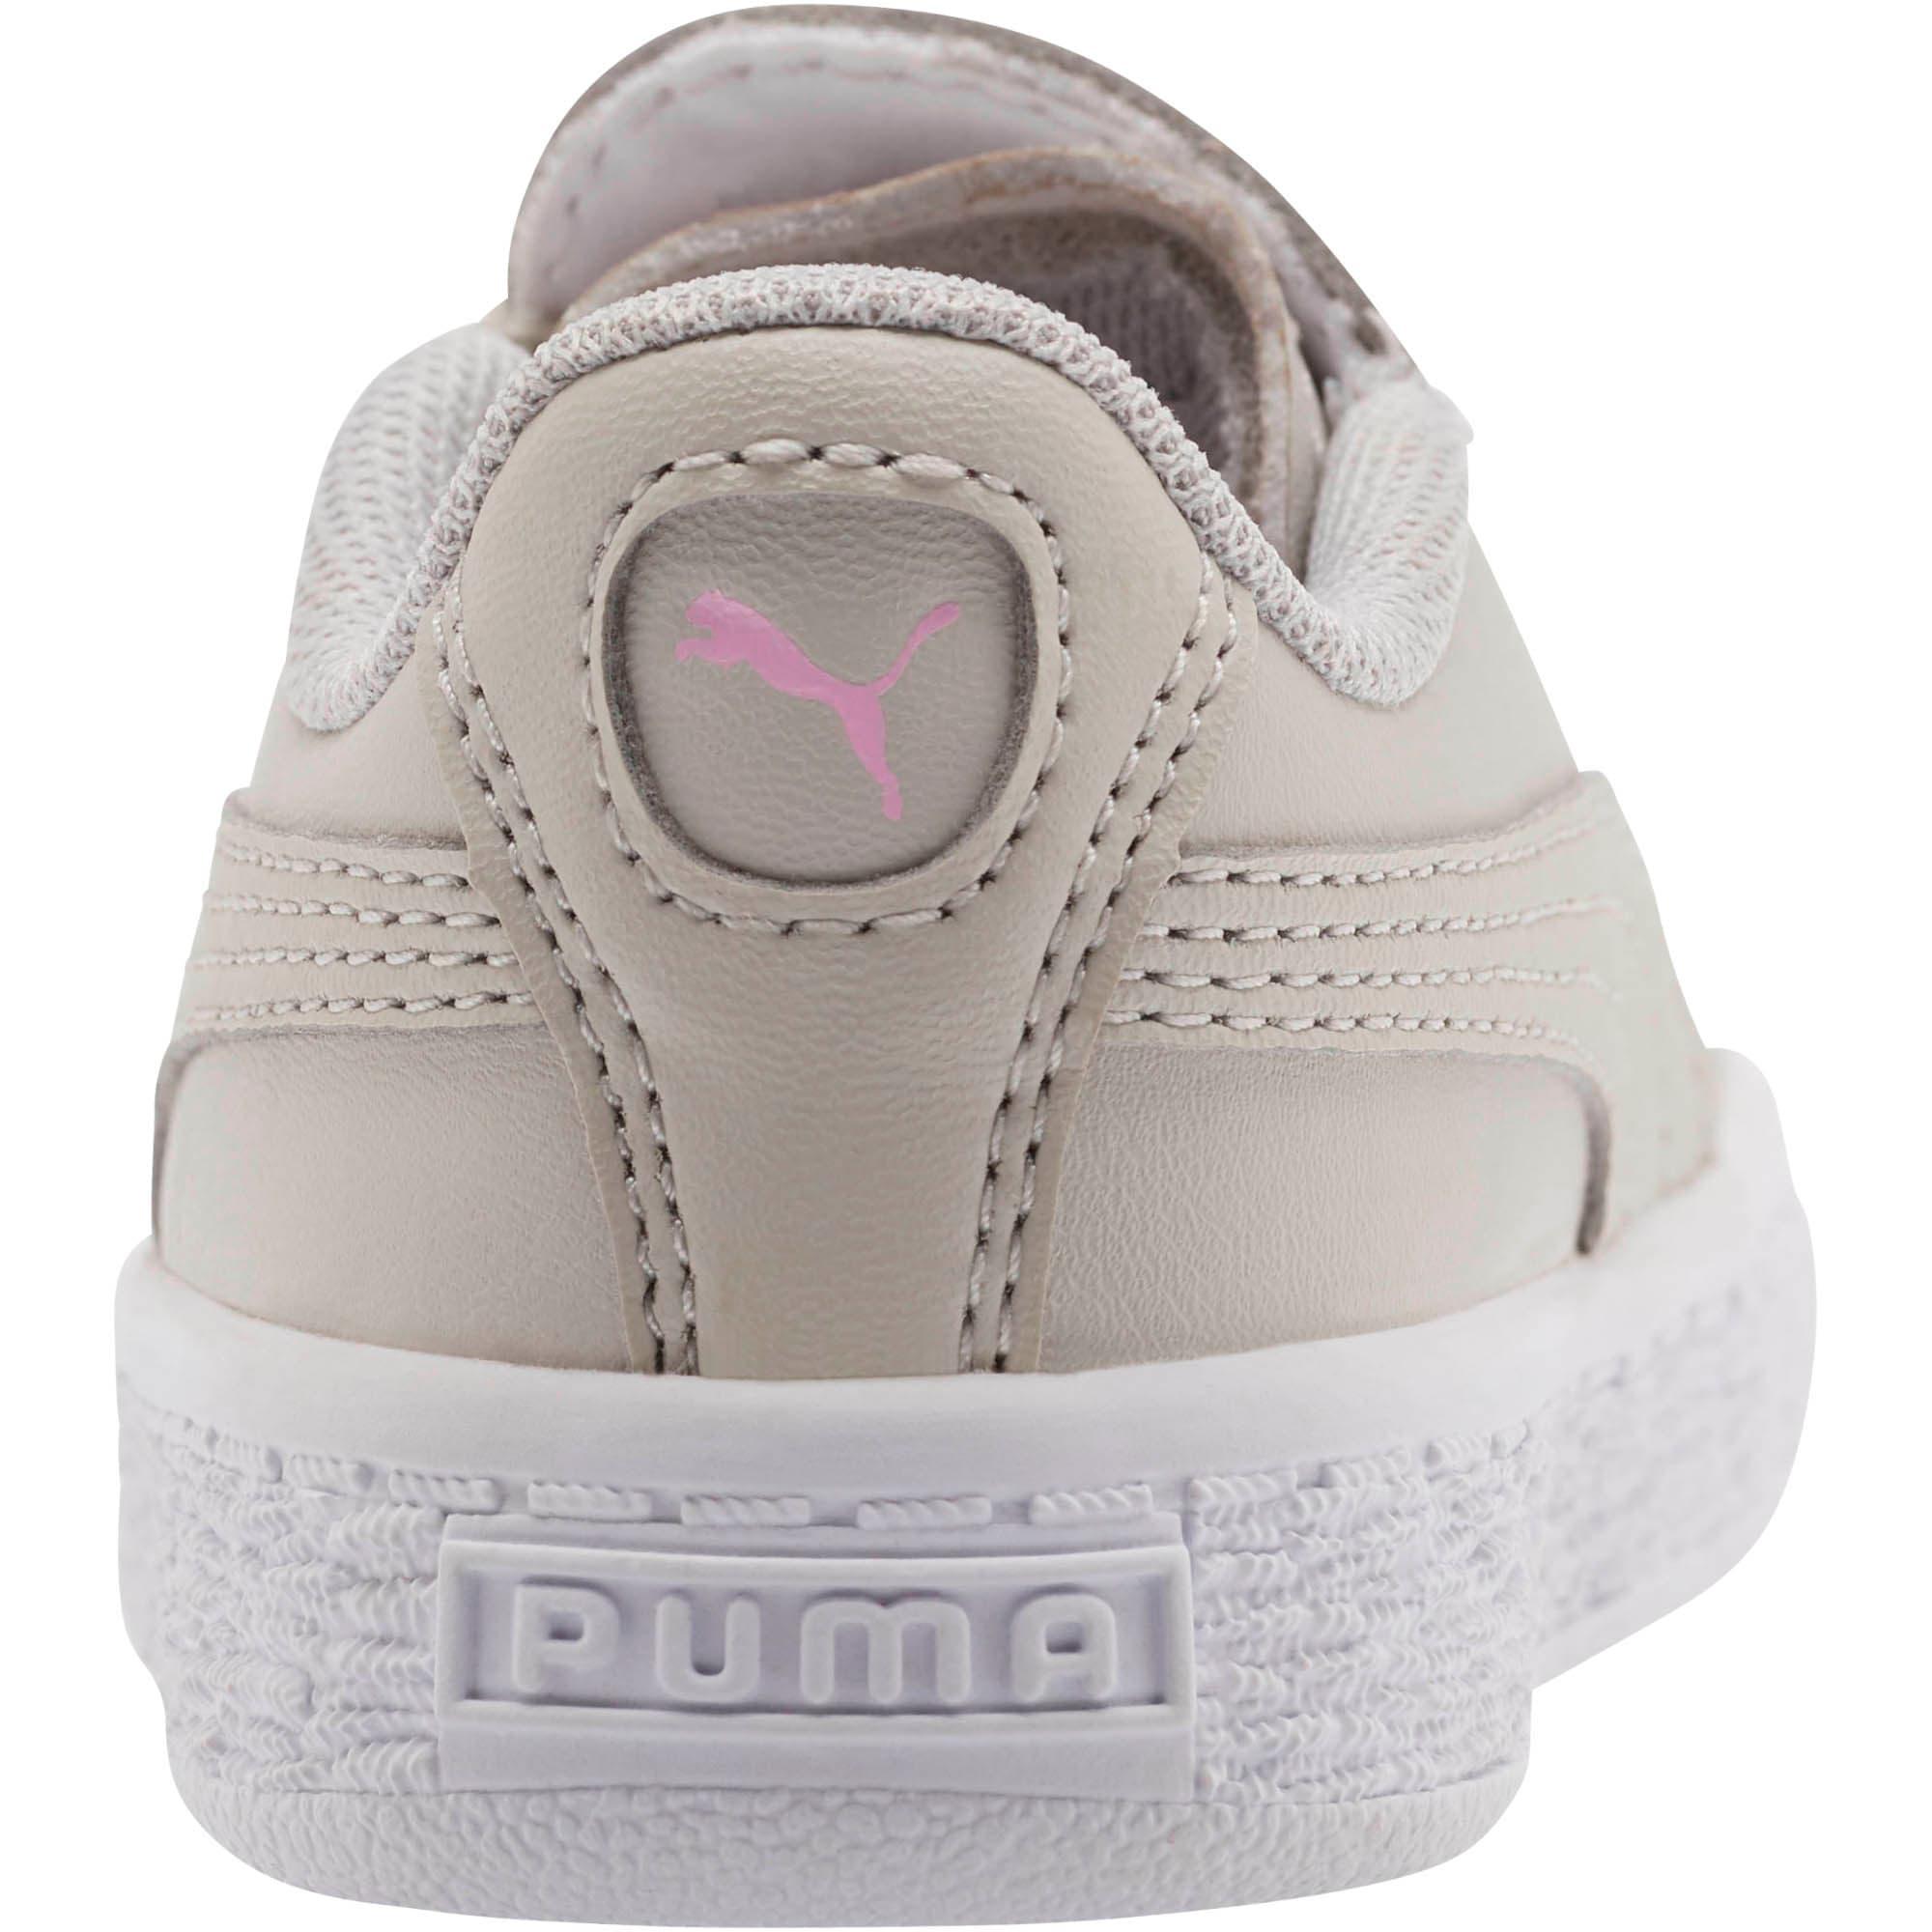 Thumbnail 3 of Basket Crush Glitter Hearts AC Toddler Shoes, Gray Violet-Puma White, medium